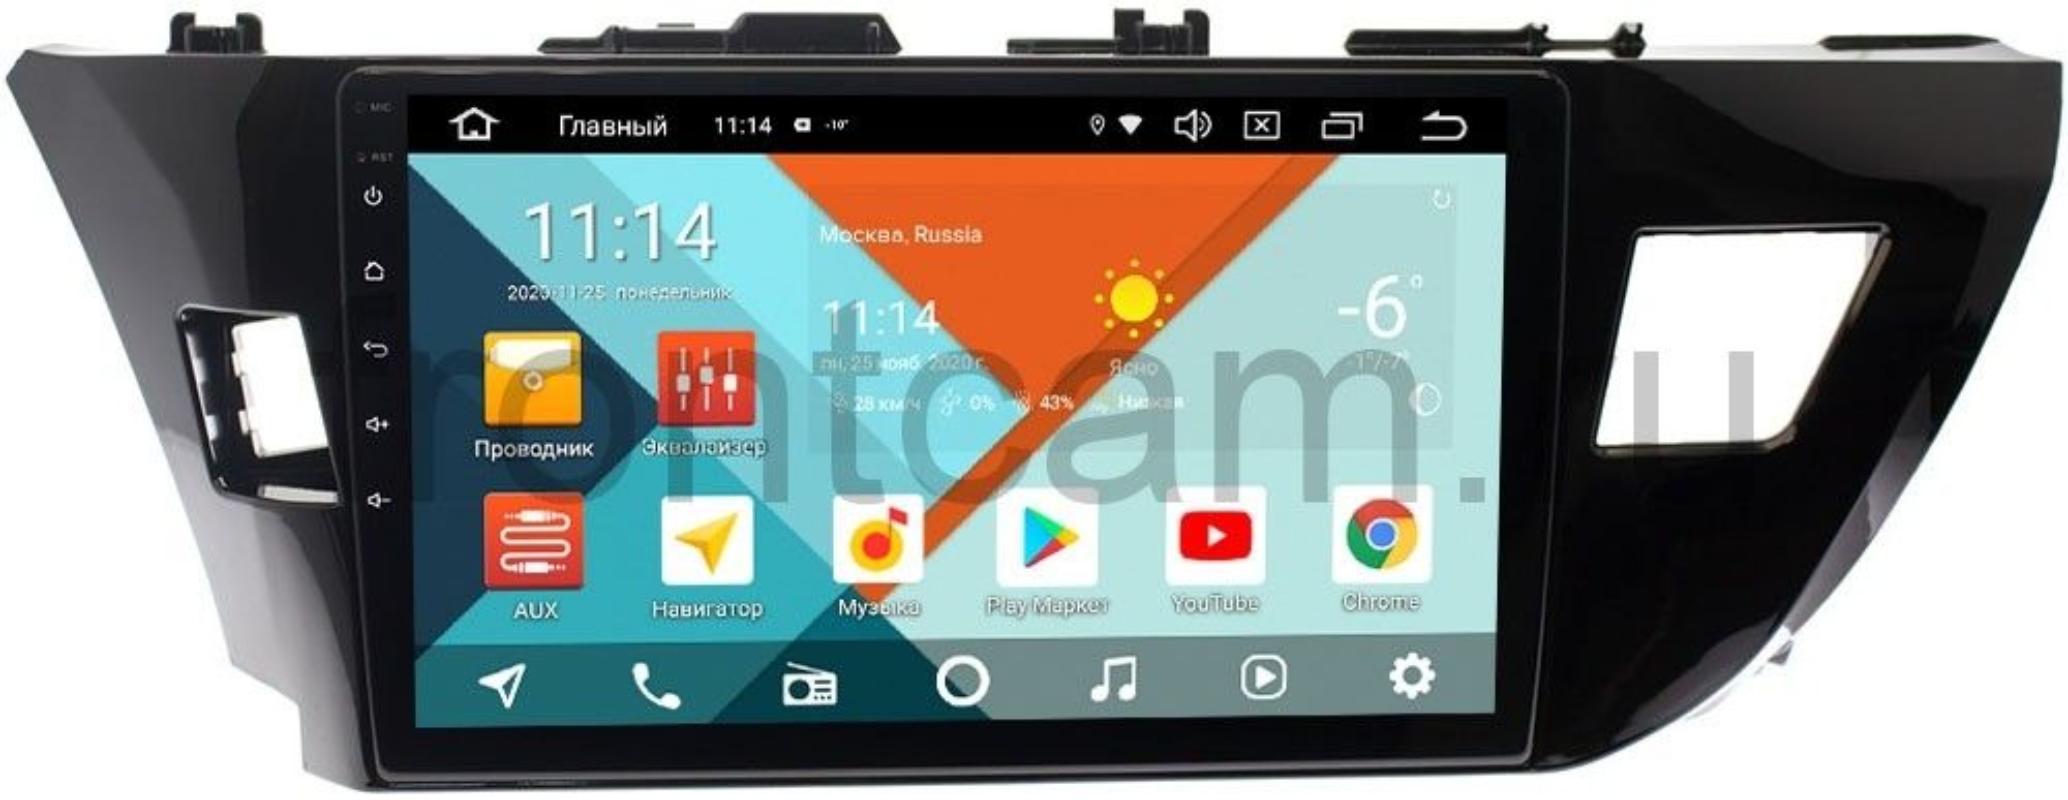 Штатная магнитола Toyota Corolla XI 2013-2015 (для авто с камерой) Wide Media KS1026QR-3/32 DSP CarPlay 4G-SIM на Android 10 (+ Камера заднего вида в подарок!)